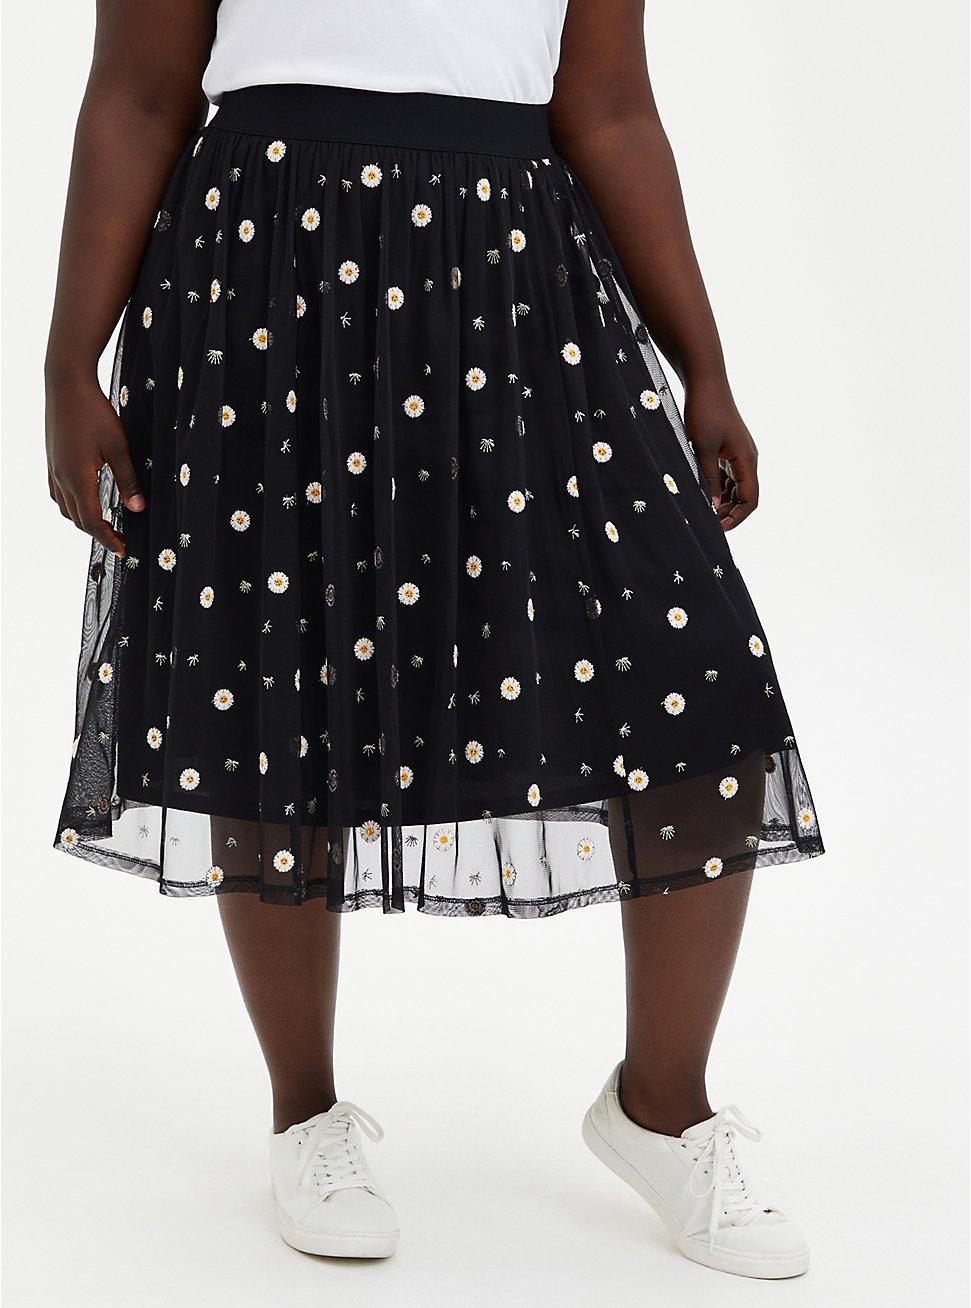 Black Lace Embroidered Midi Skirt, BLACK-WHITE FLORAL, hi-res